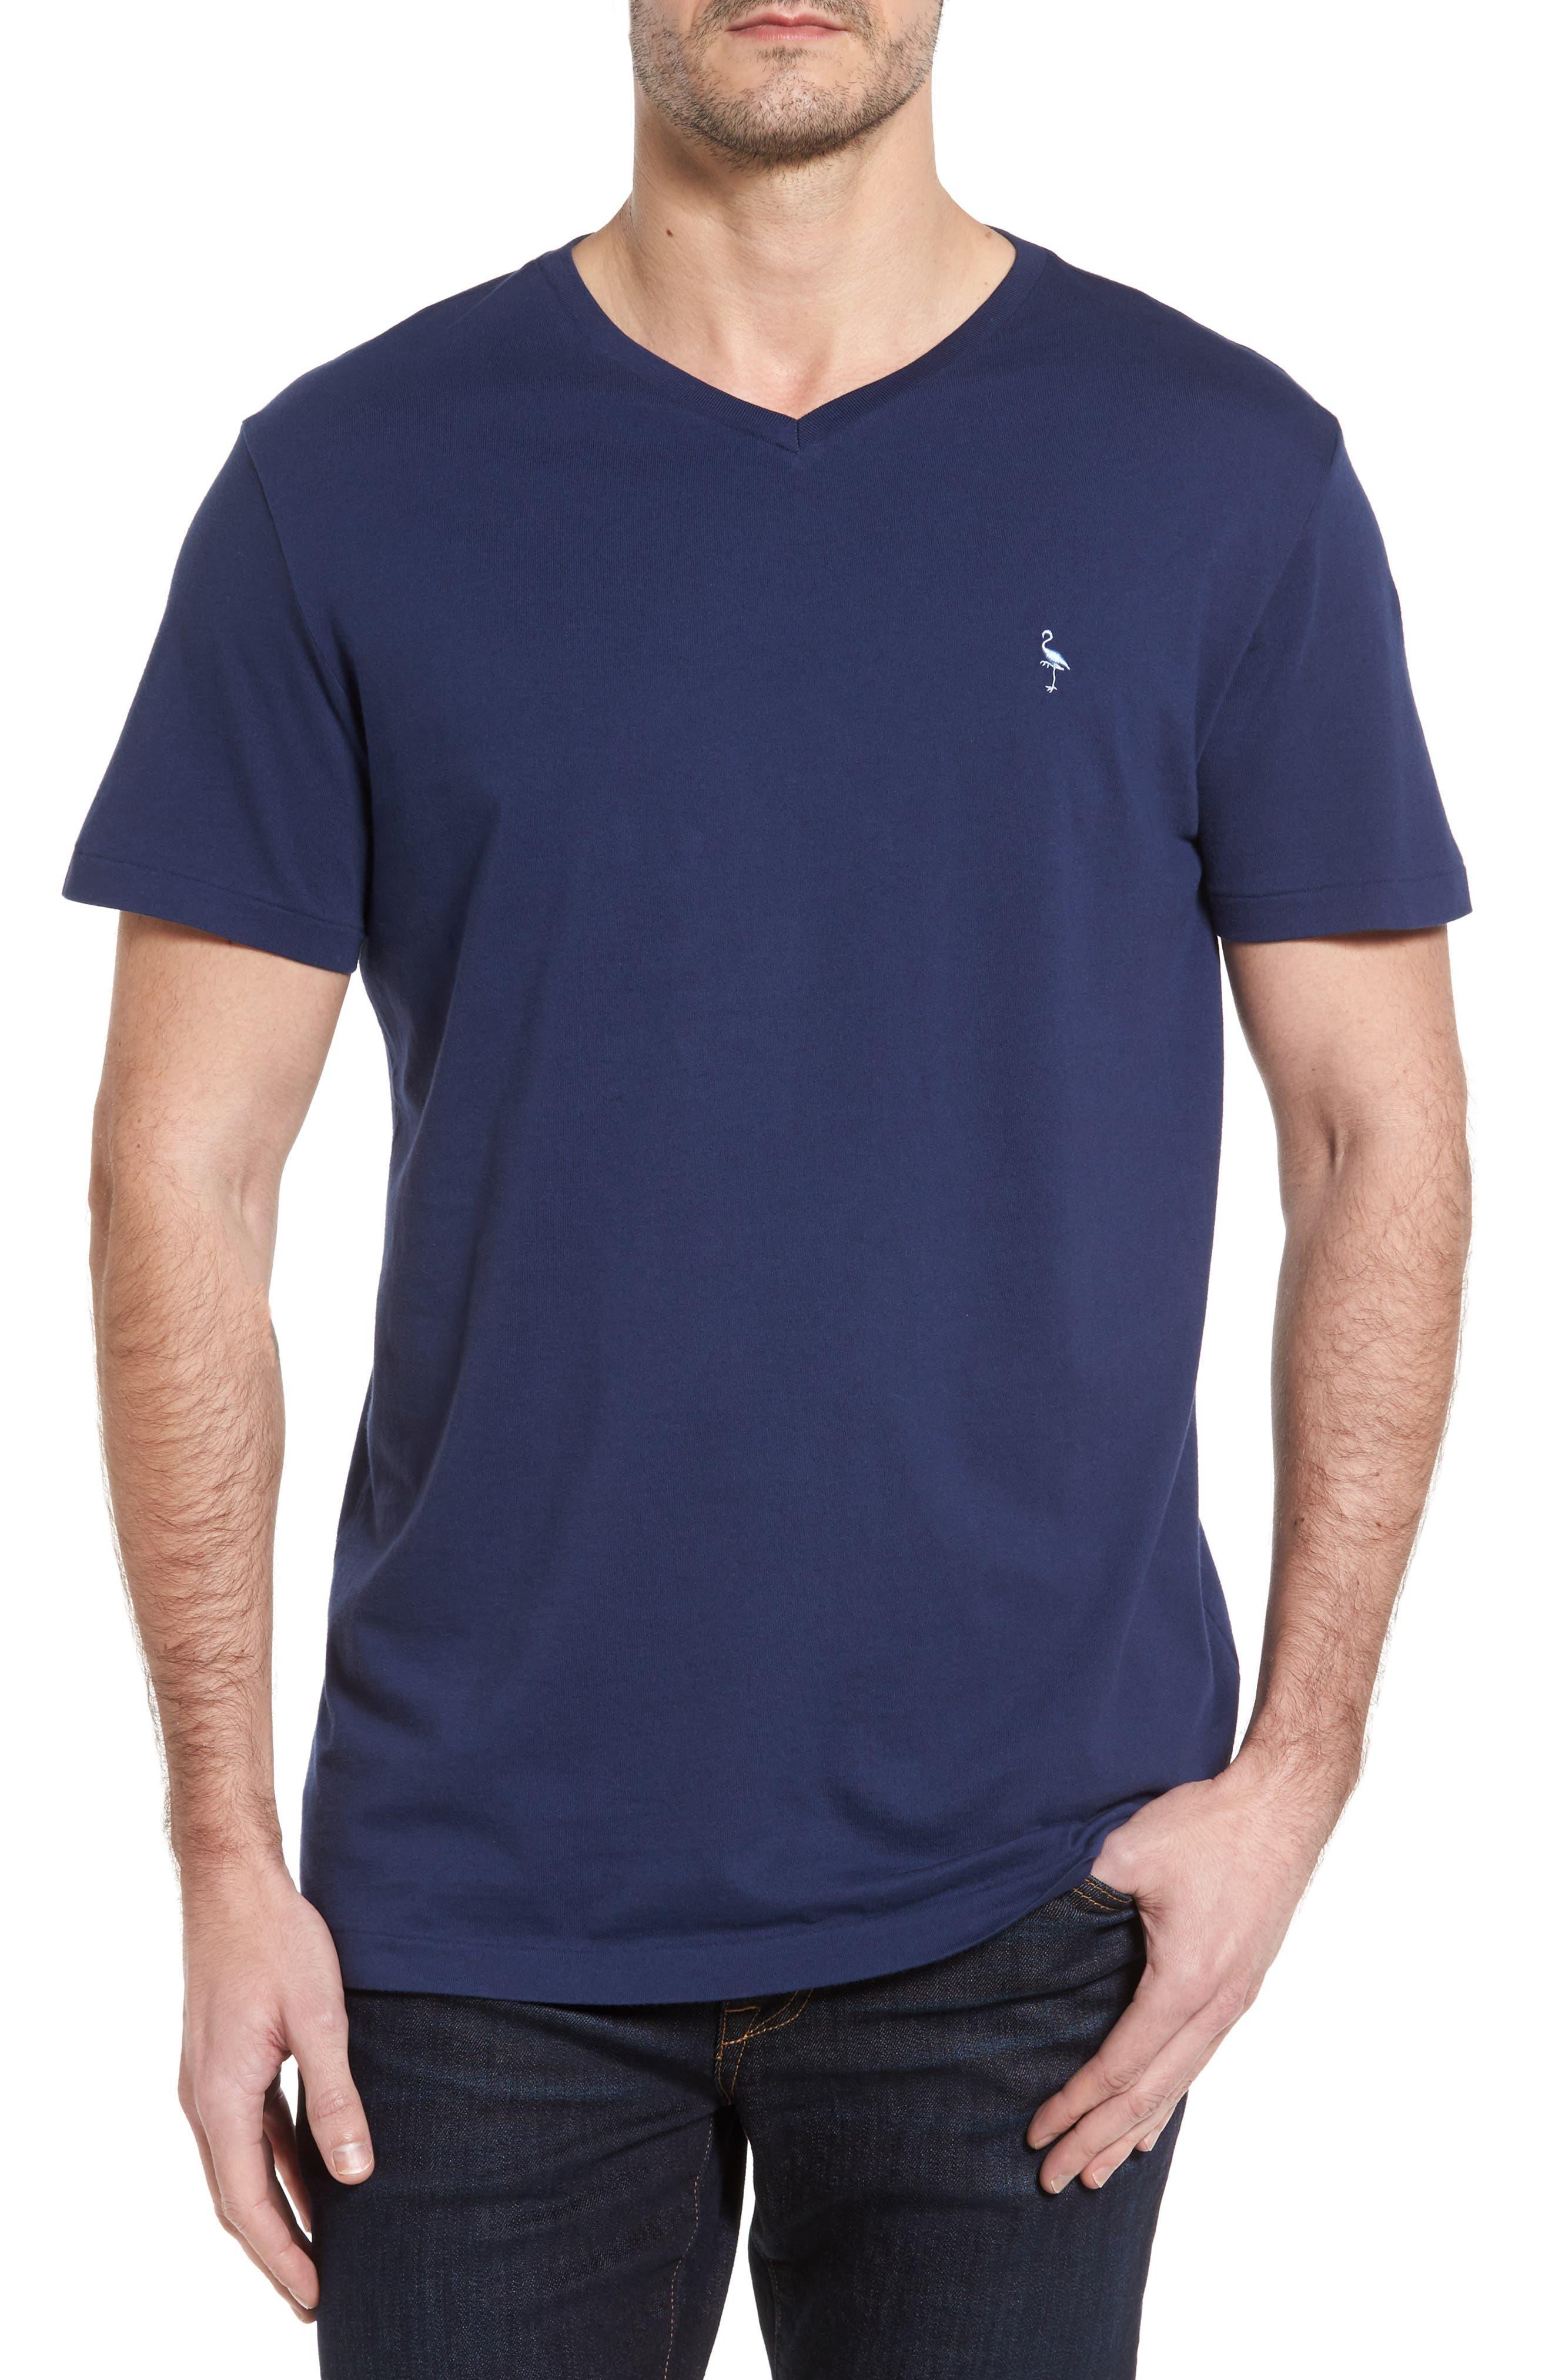 Main Image - TailorByrd V-Neck T-Shirt